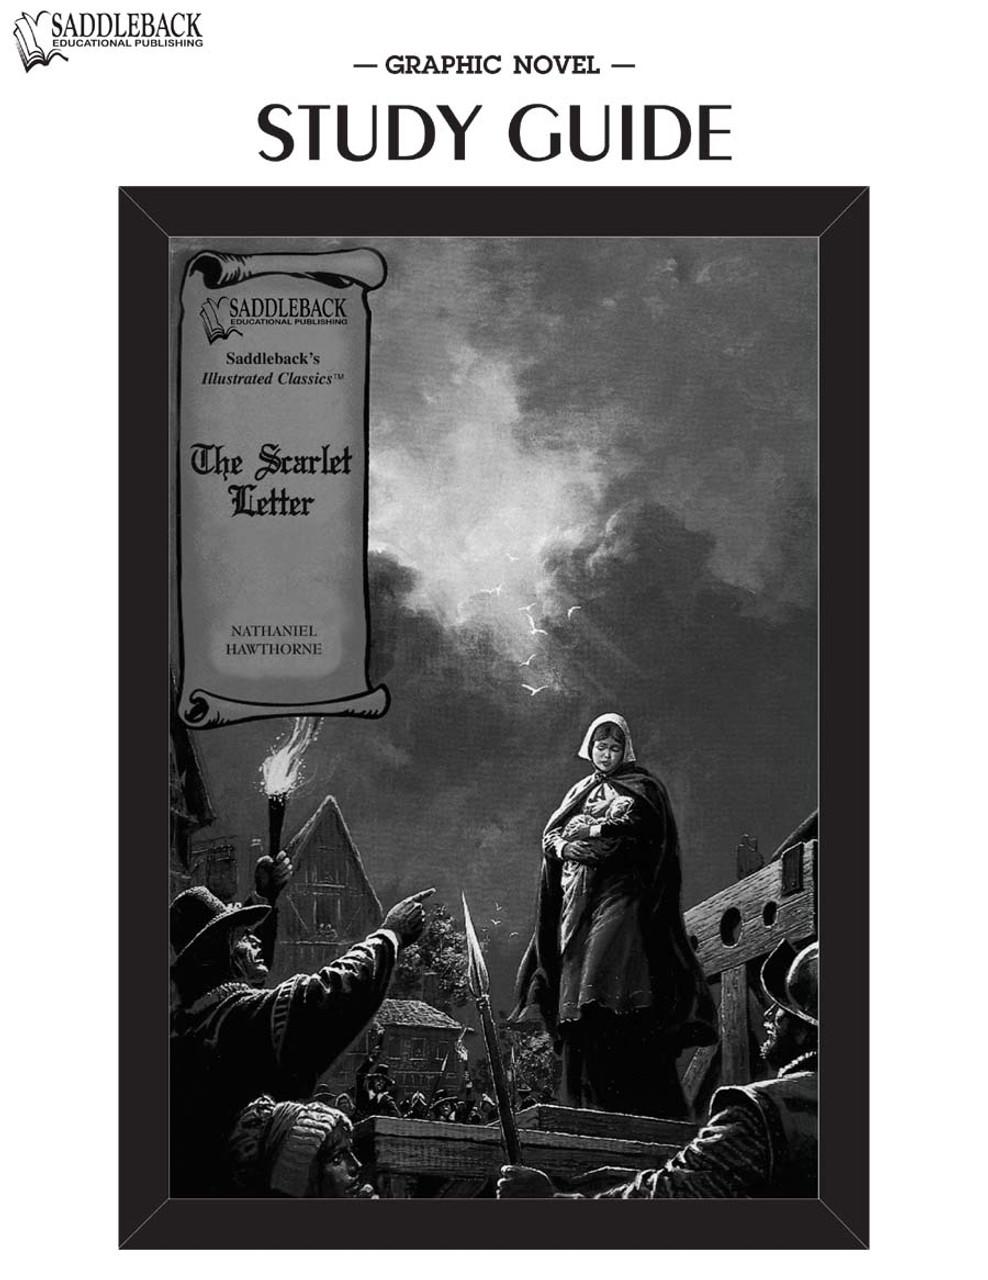 The Scarlet Letter Graphic Novel Study Guide - SADDLEBACK - 9781602916524